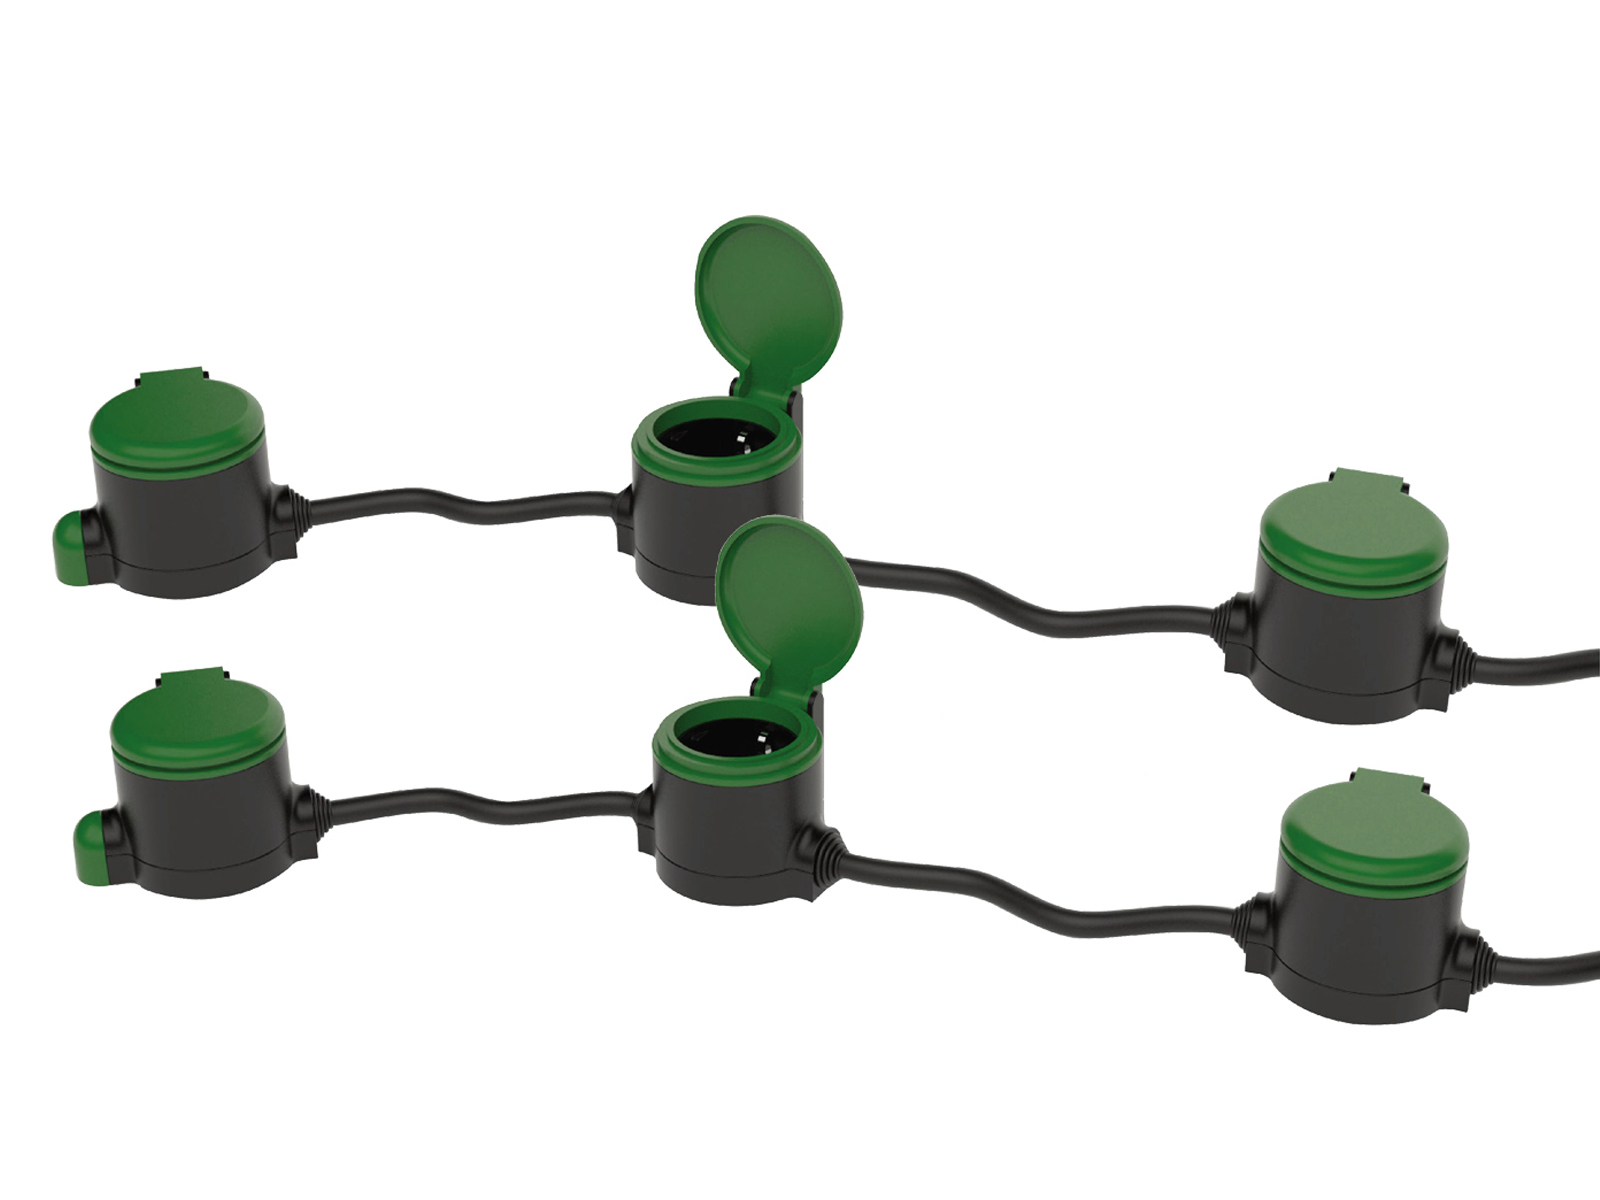 2er Set Outdoor Stromverteiler 3x Steckdosen 10 Meter Kabel